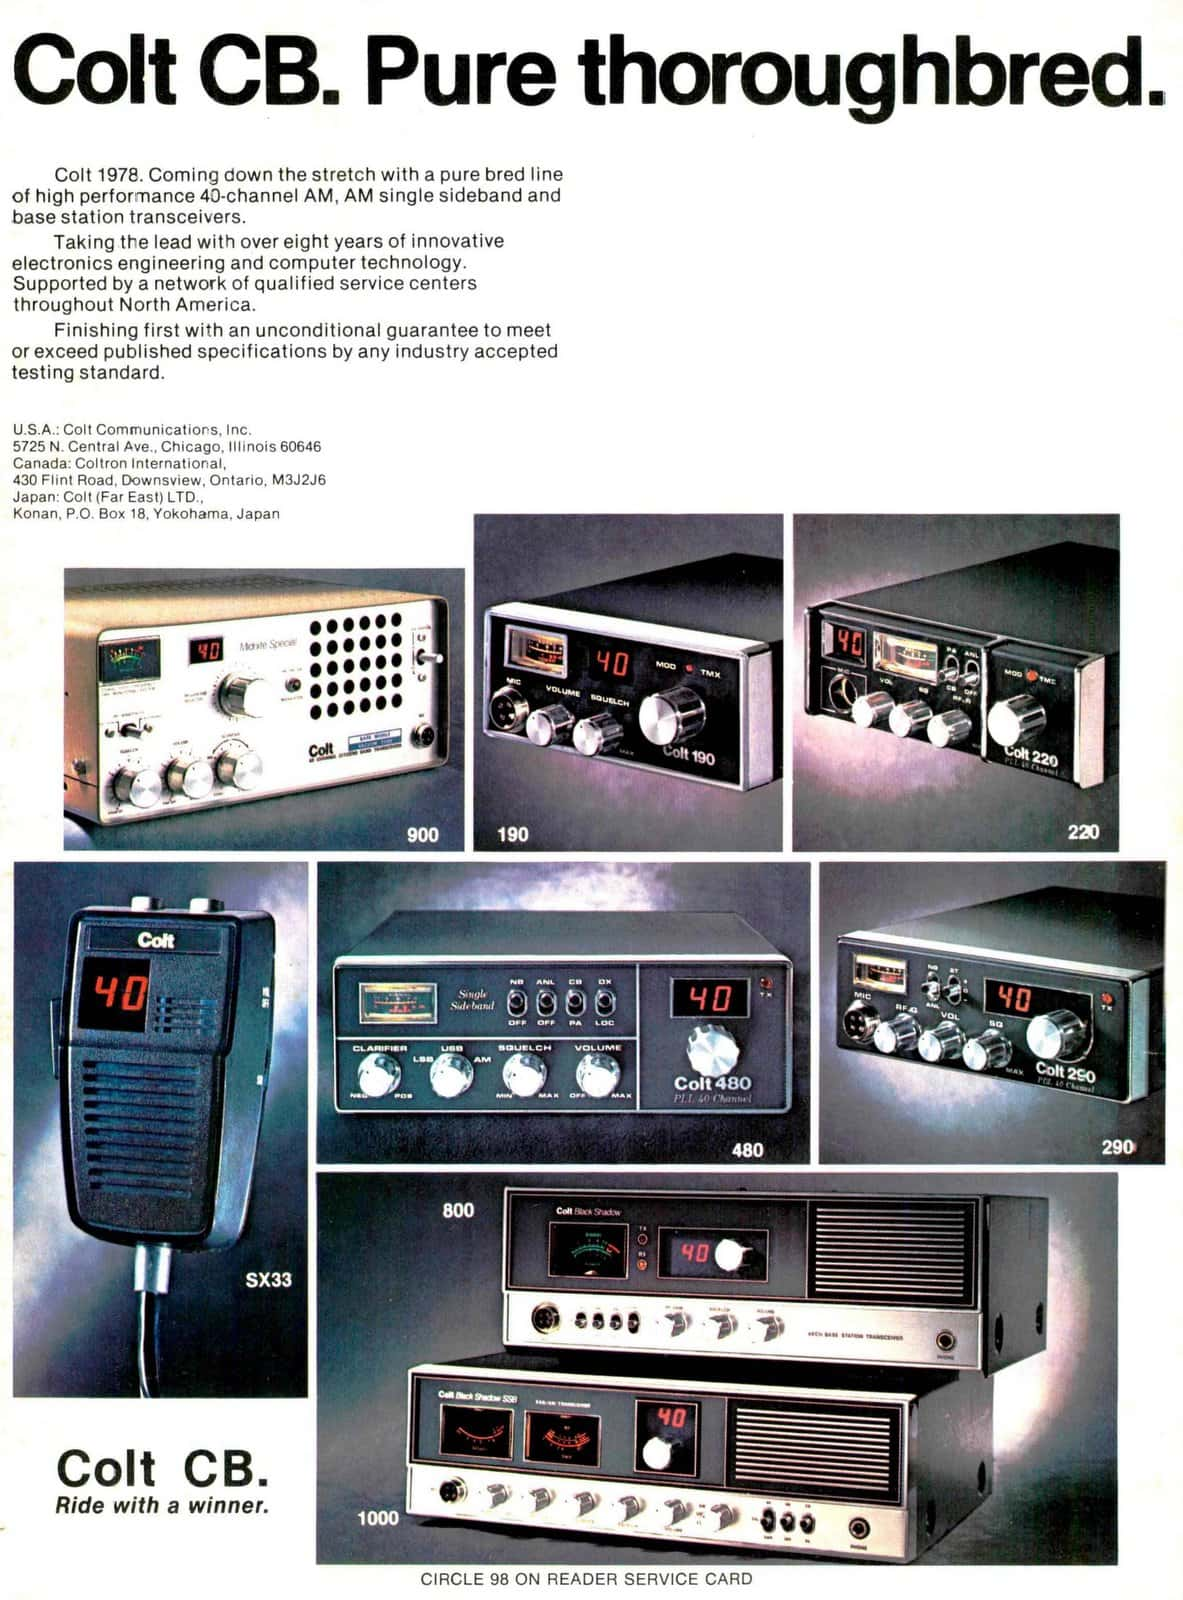 Colt CB 1978